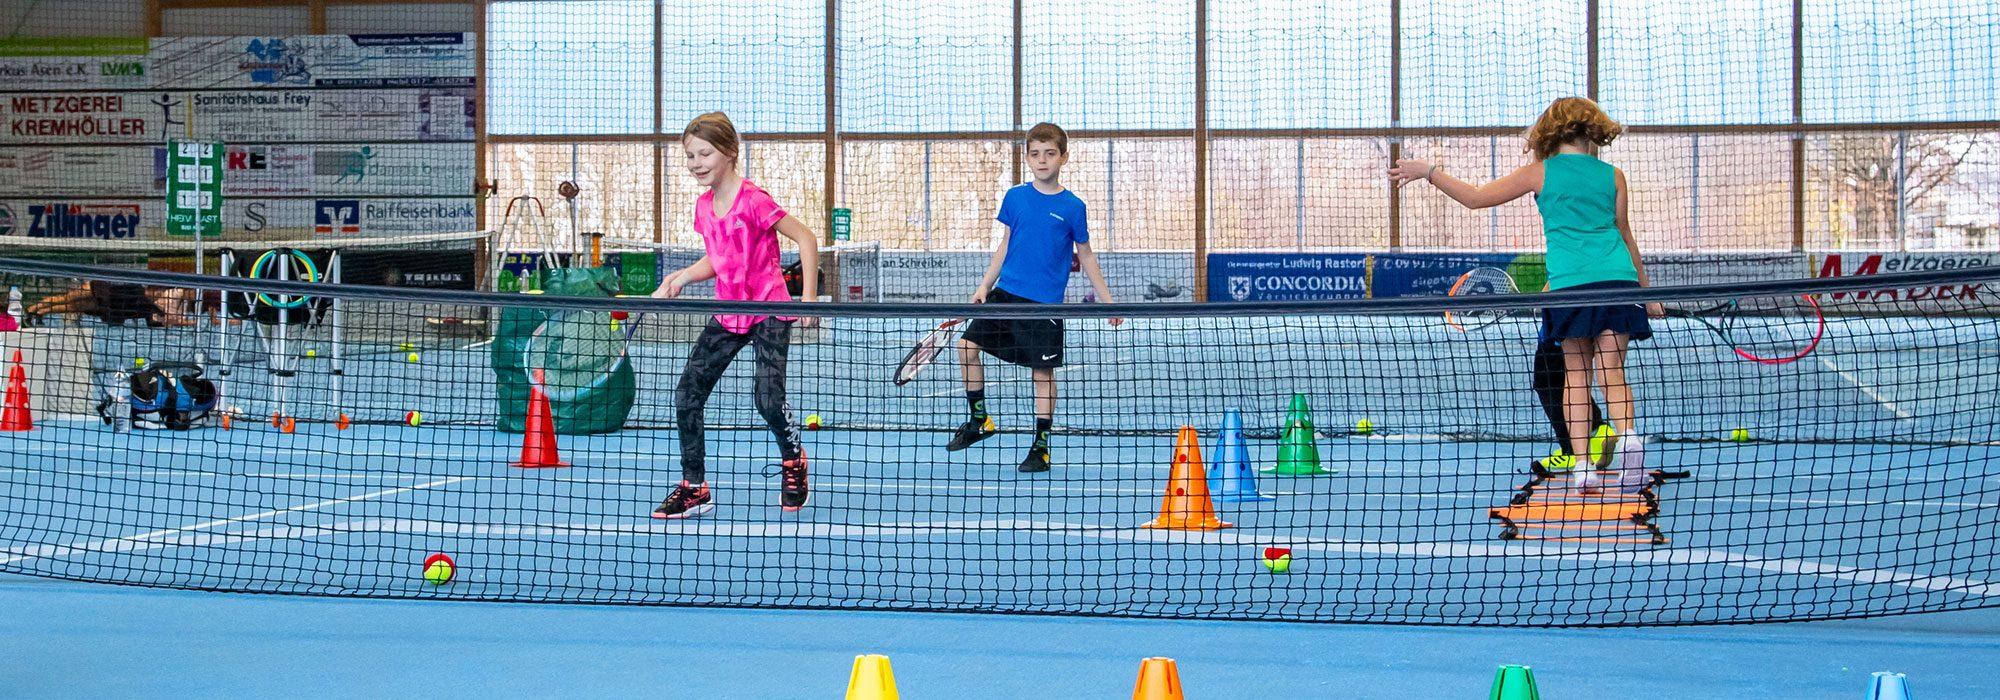 Kindergartentennis | Tennisschule Knogler